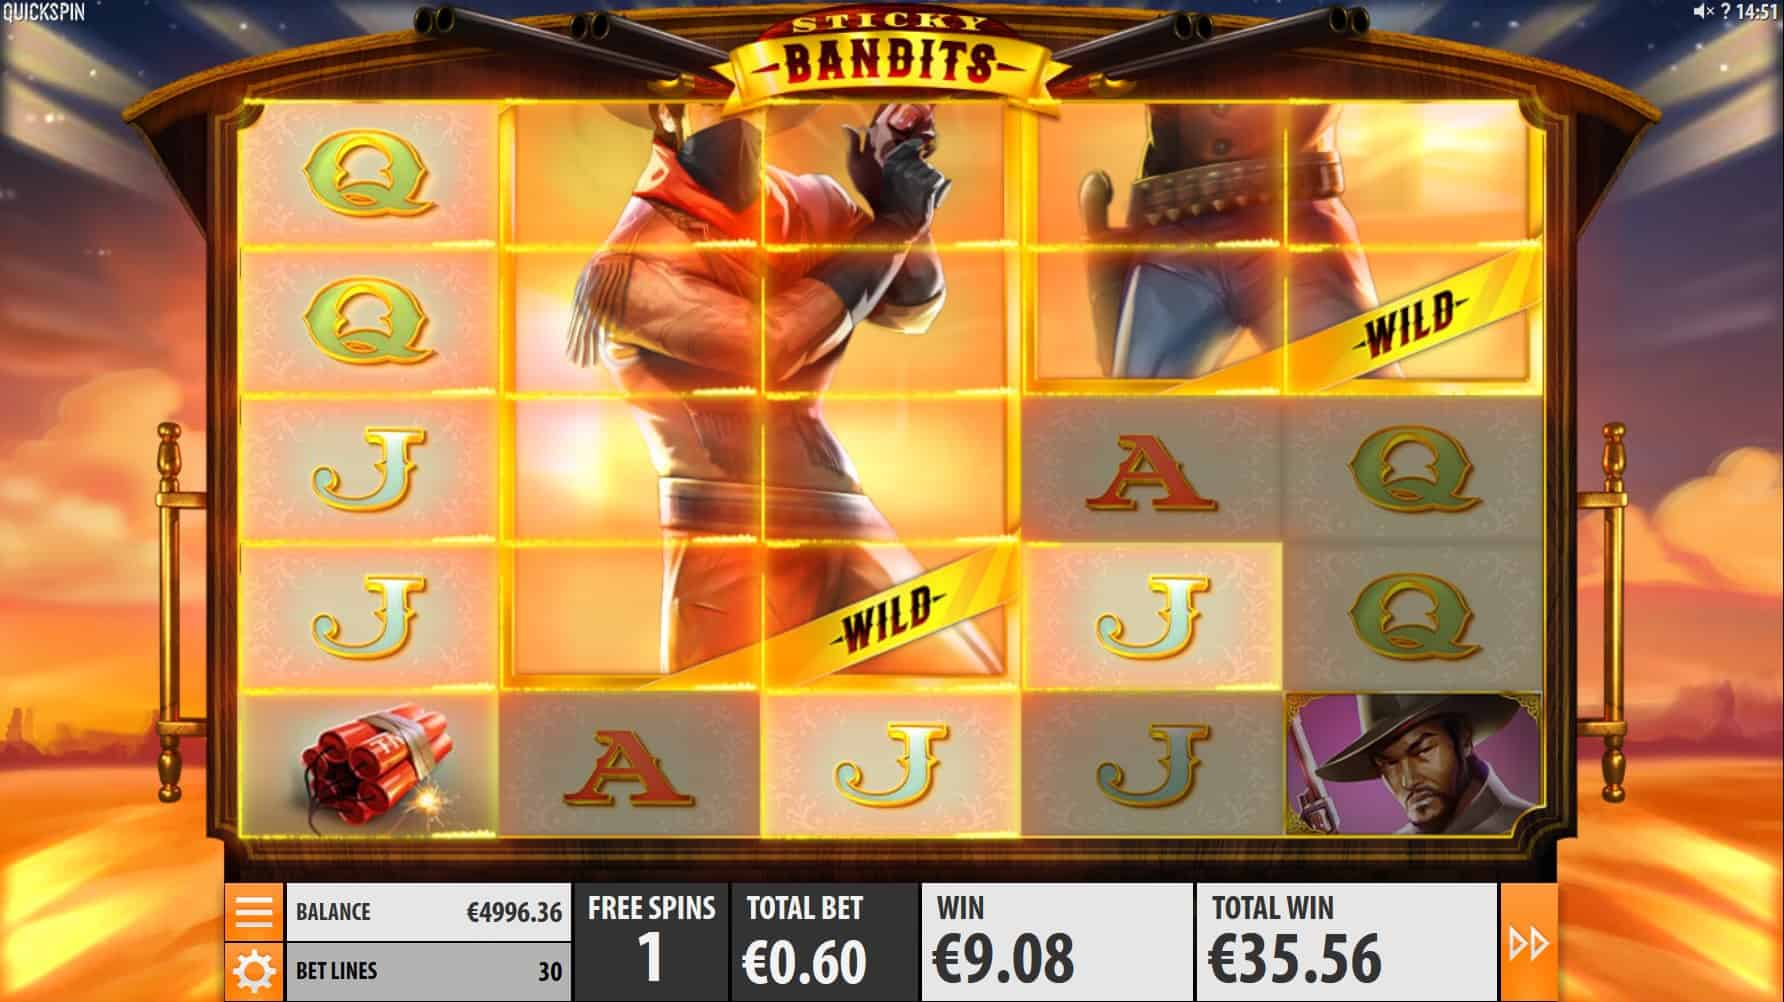 quickspin - sticky bandits - massive wilds - casinogroundsdotcom